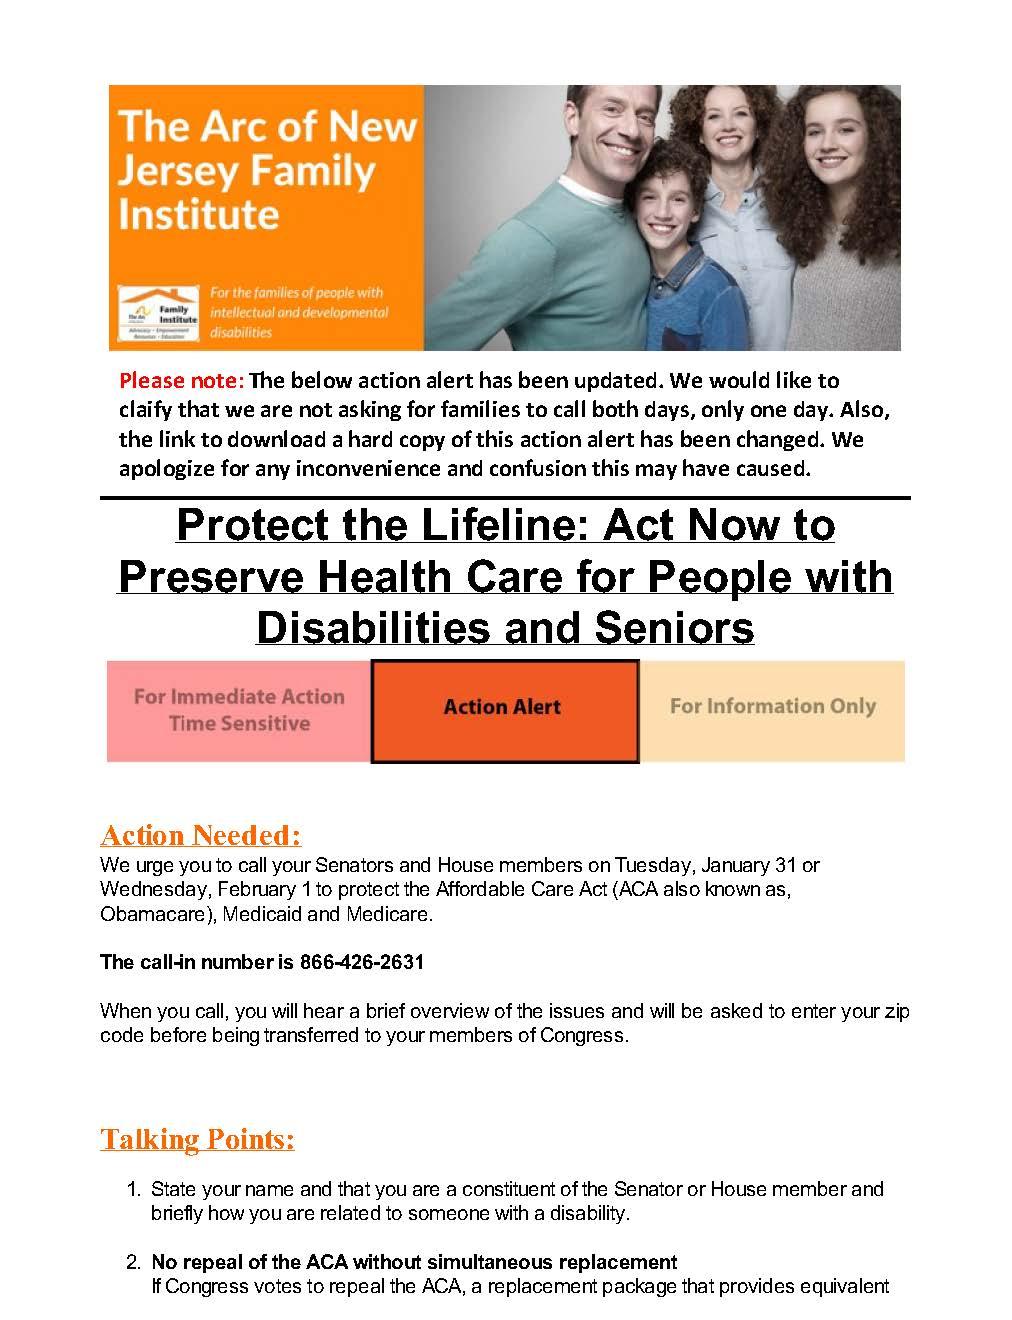 Preserve the ACA Call-in days - 1.30.2017